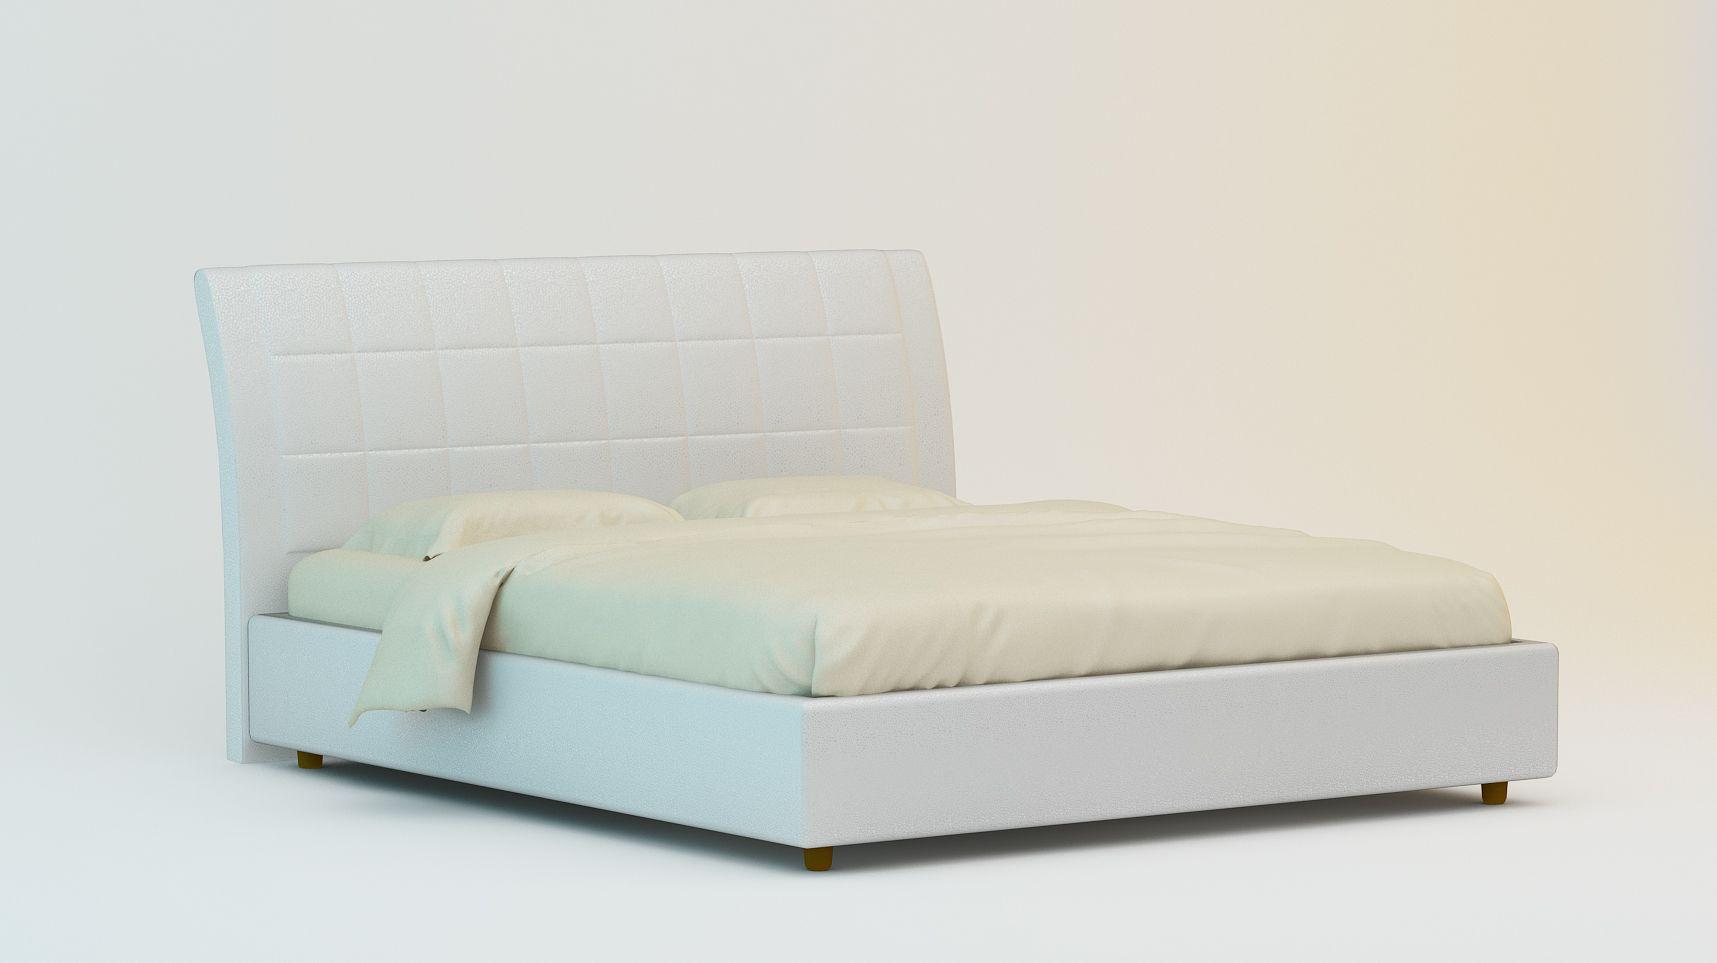 3D Bed Model 94 Free Download   Bed. Furniture. Soft seating